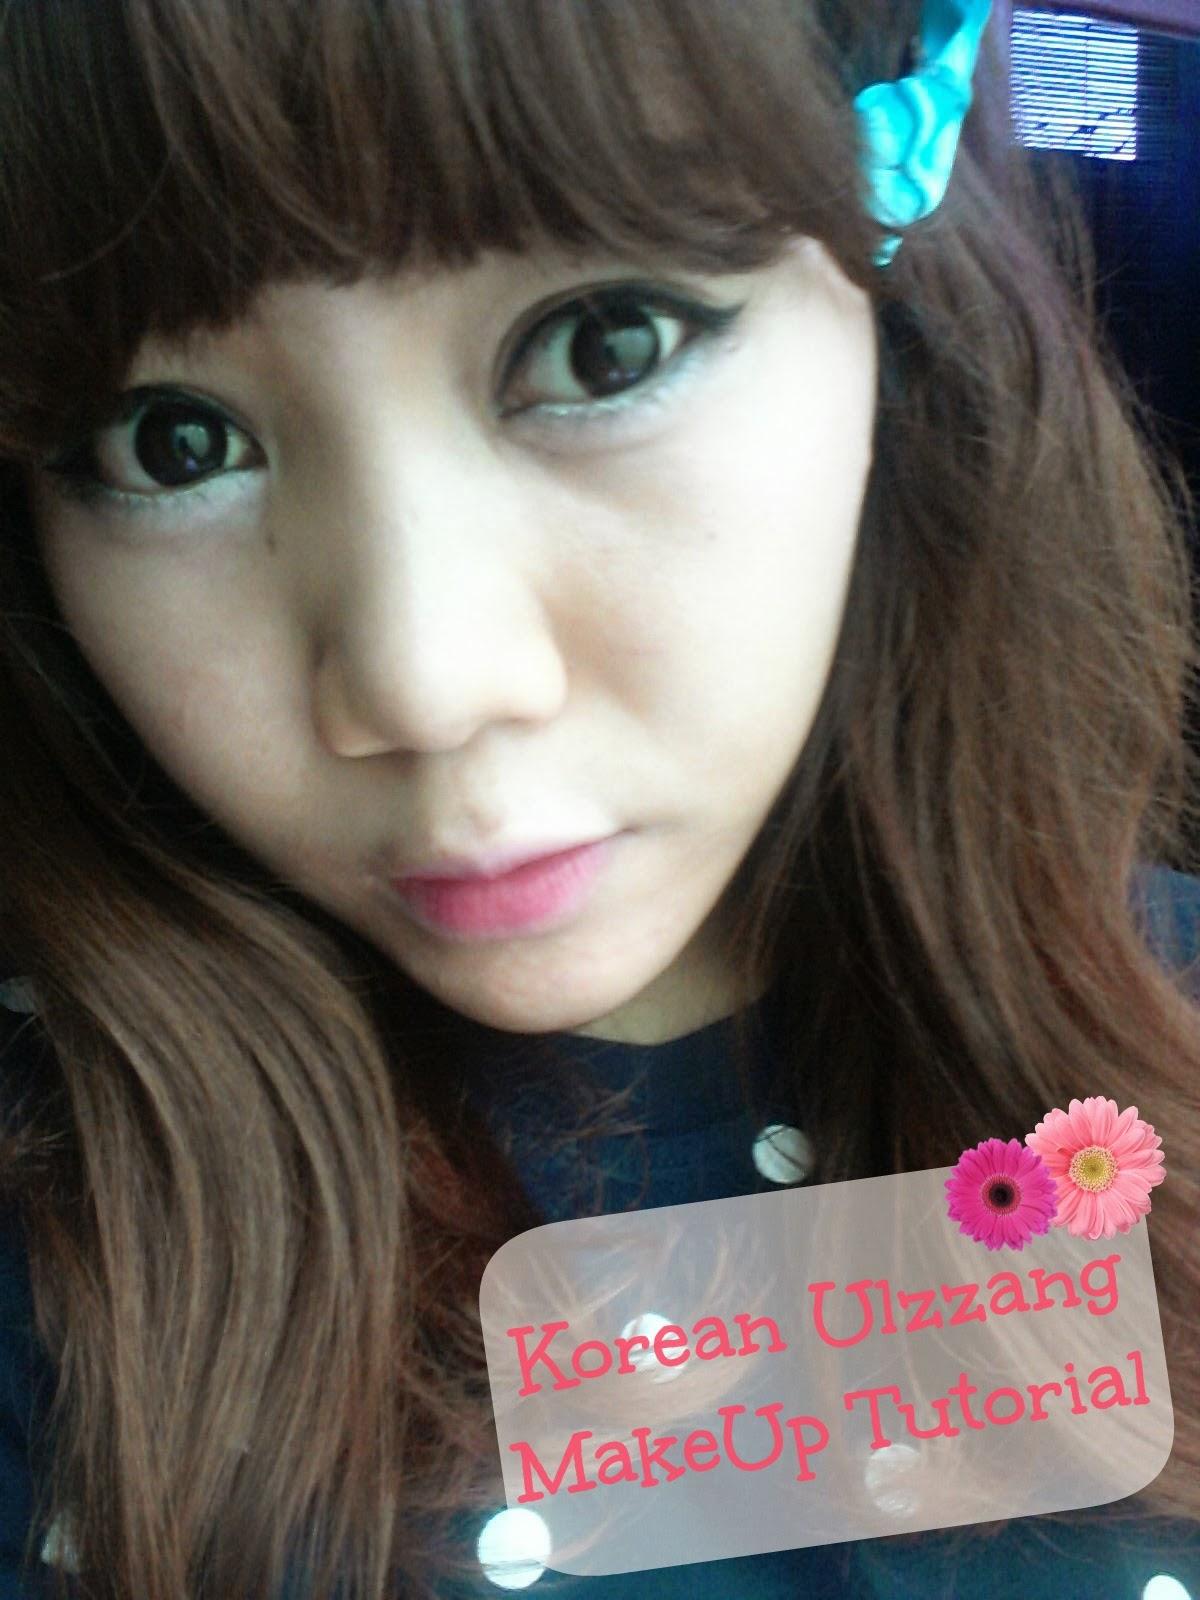 Sweet Peach: [MAKEUP] Korean Ulzzang Makeup